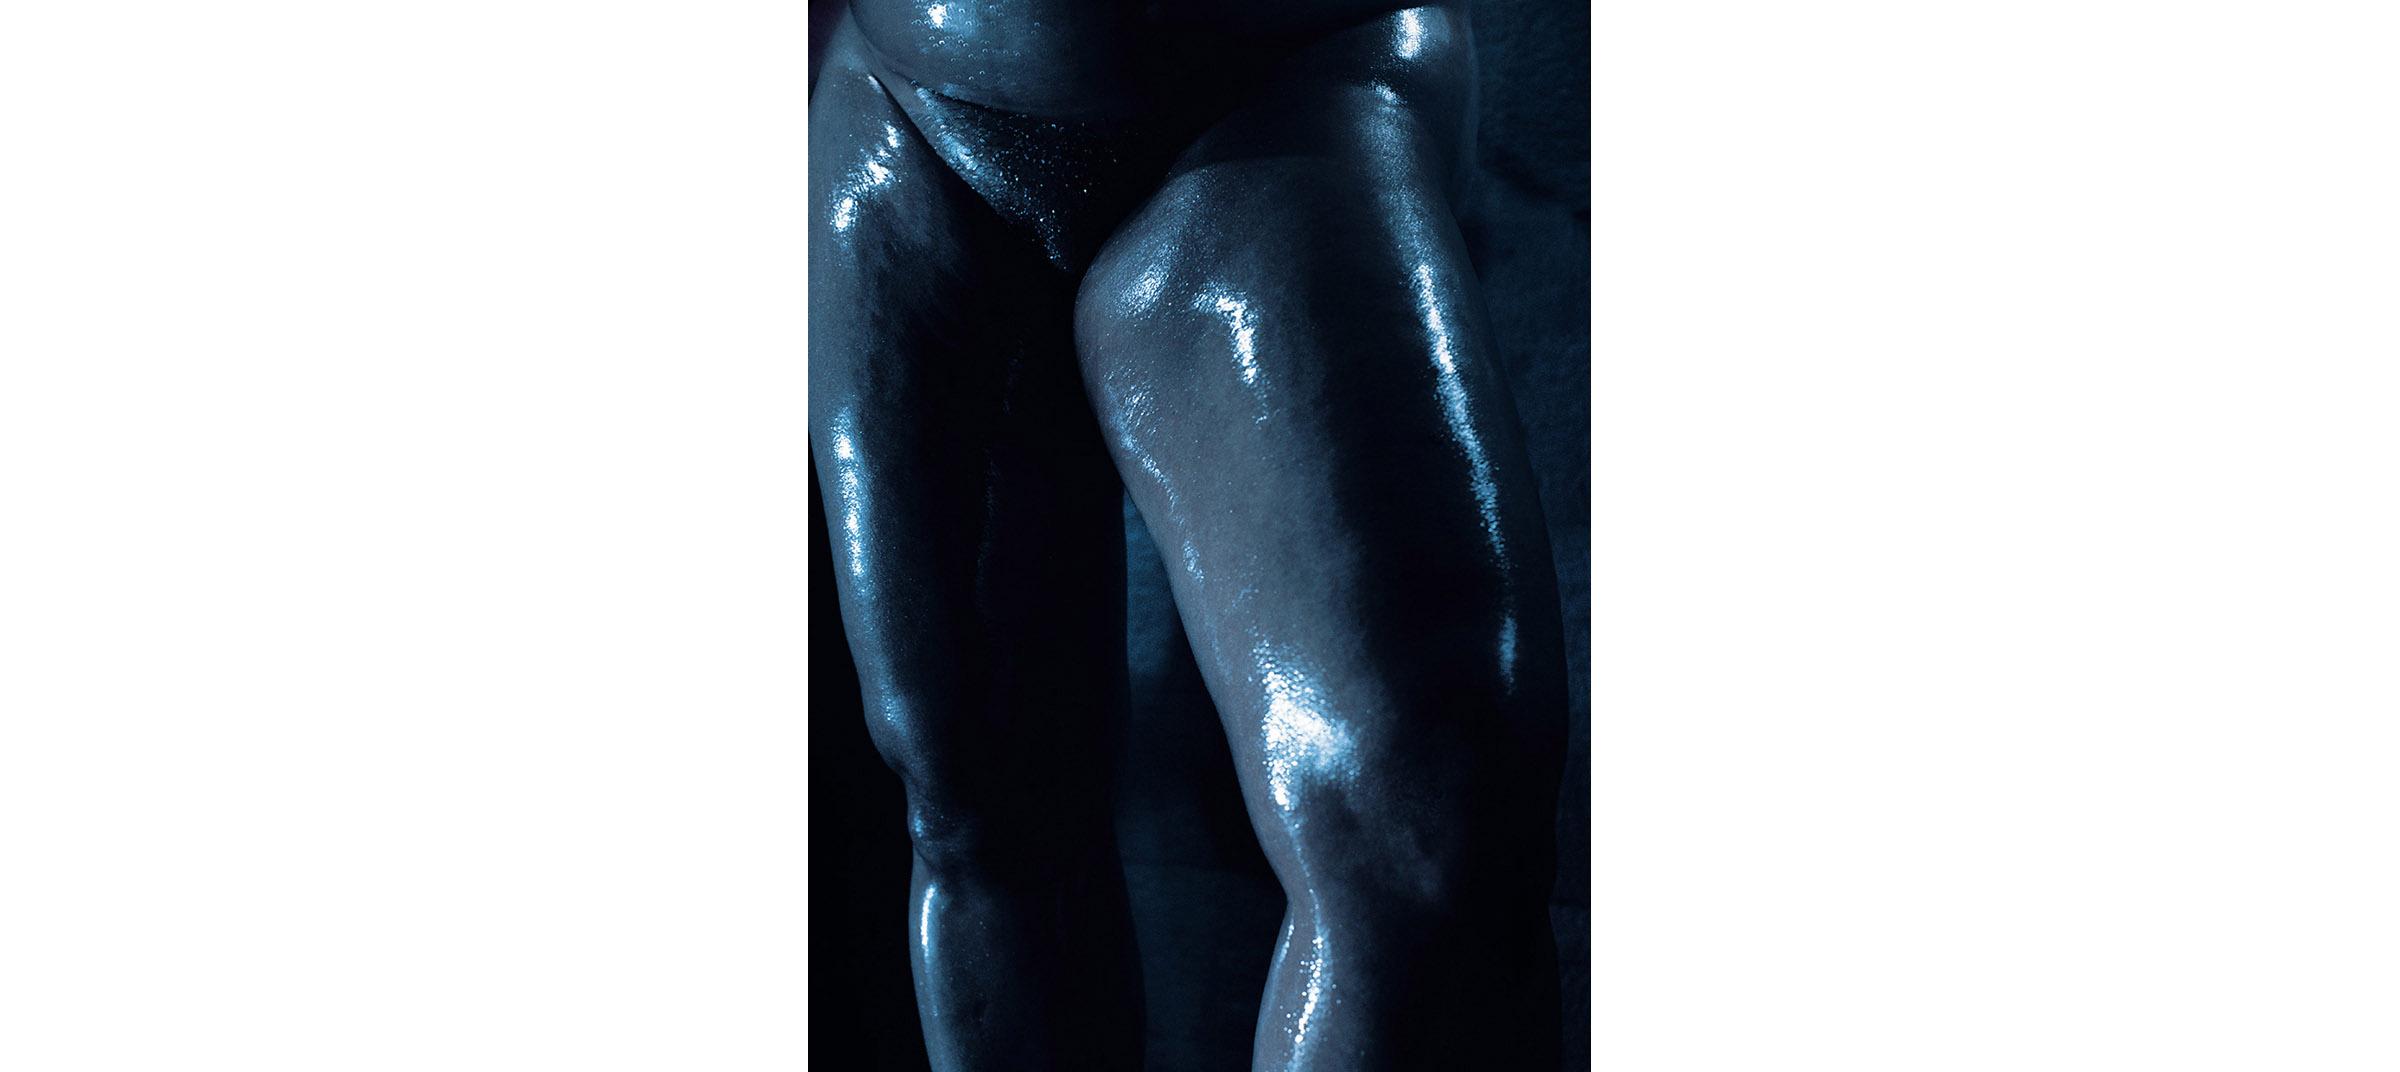 Blue Nudes  Untitled N°1, 2005 Tirage gélatino argentique, 144 x 104 cm | Gelatin silver print 56,59 x 40,94 inches  2/5